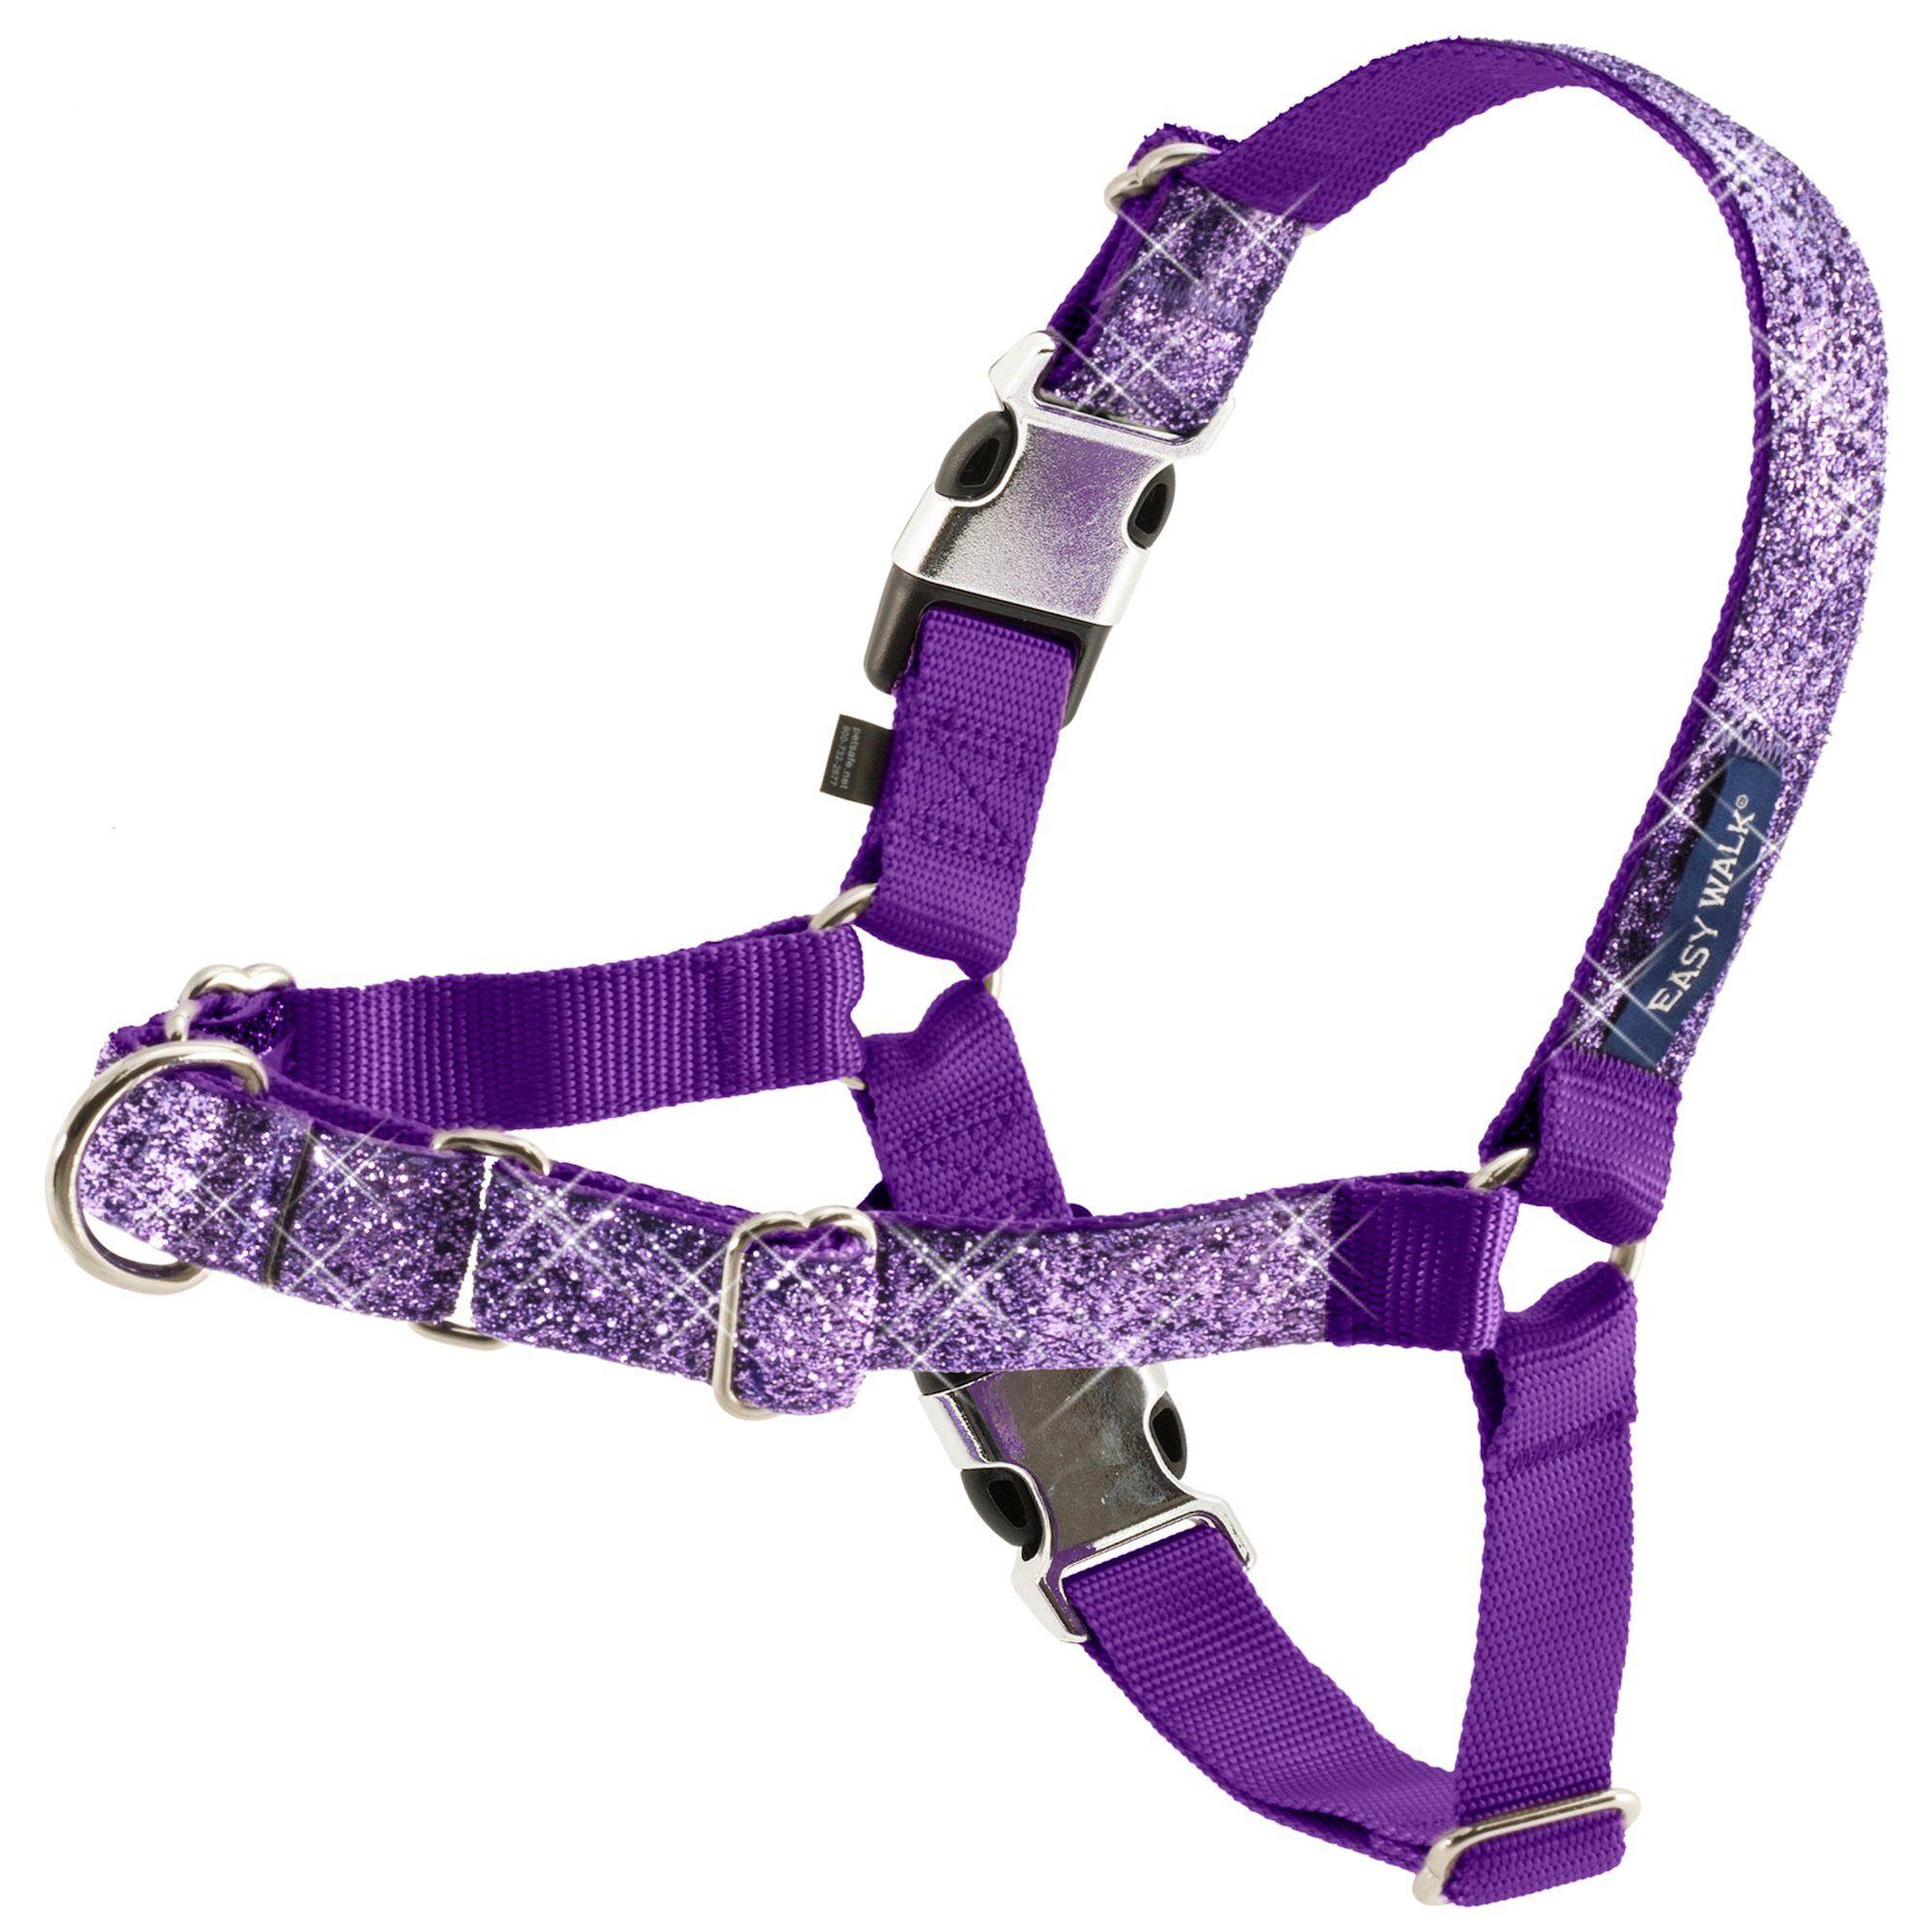 Petsafe Easy Walk Harness In Purple Bling Medium Dog Training Harness Aggressive Dog Dog Harness